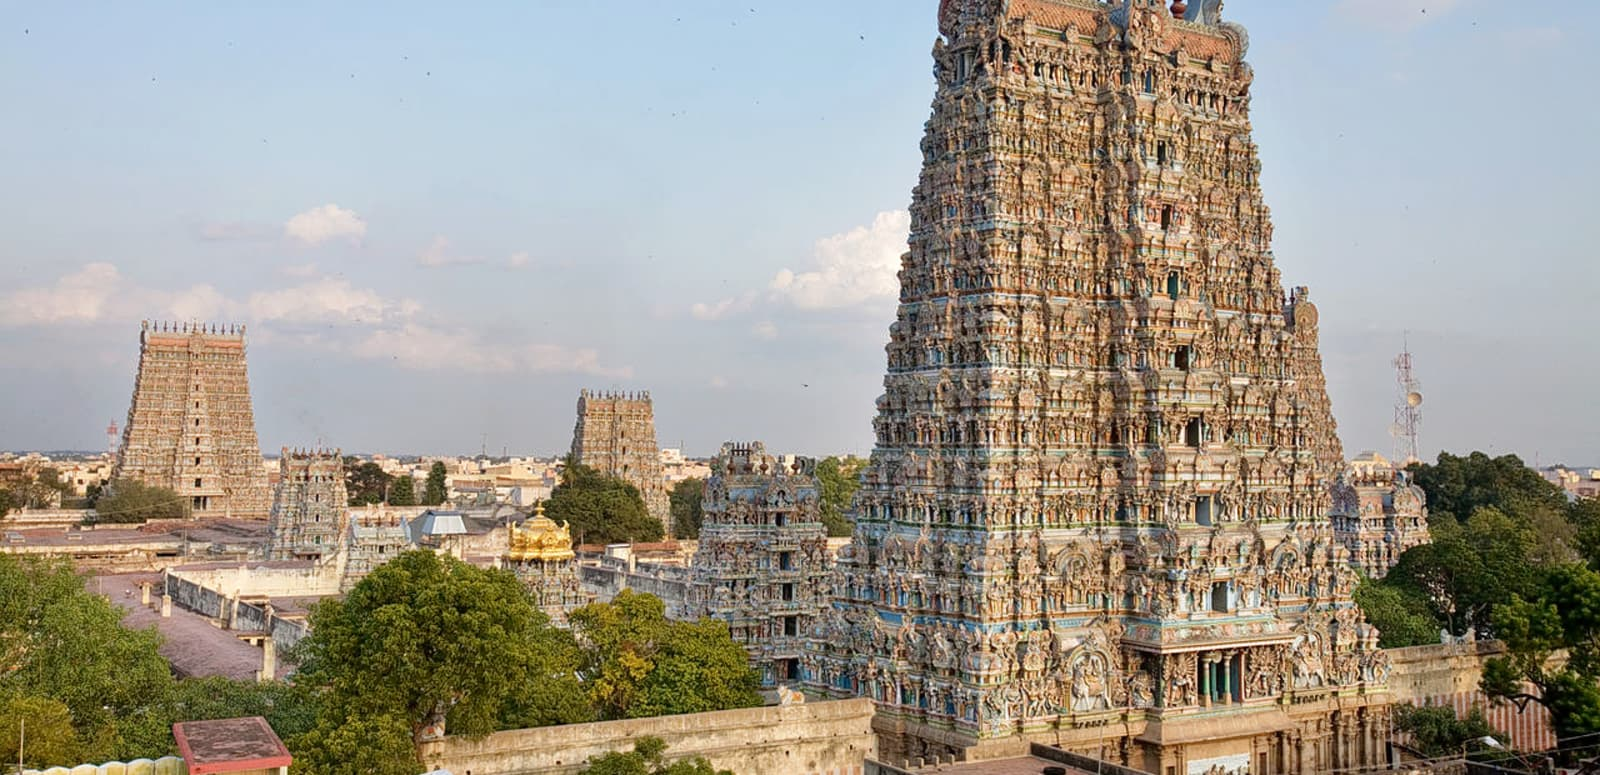 1493365536_1280px-india_-_madurai_temple_-_0781.jpg